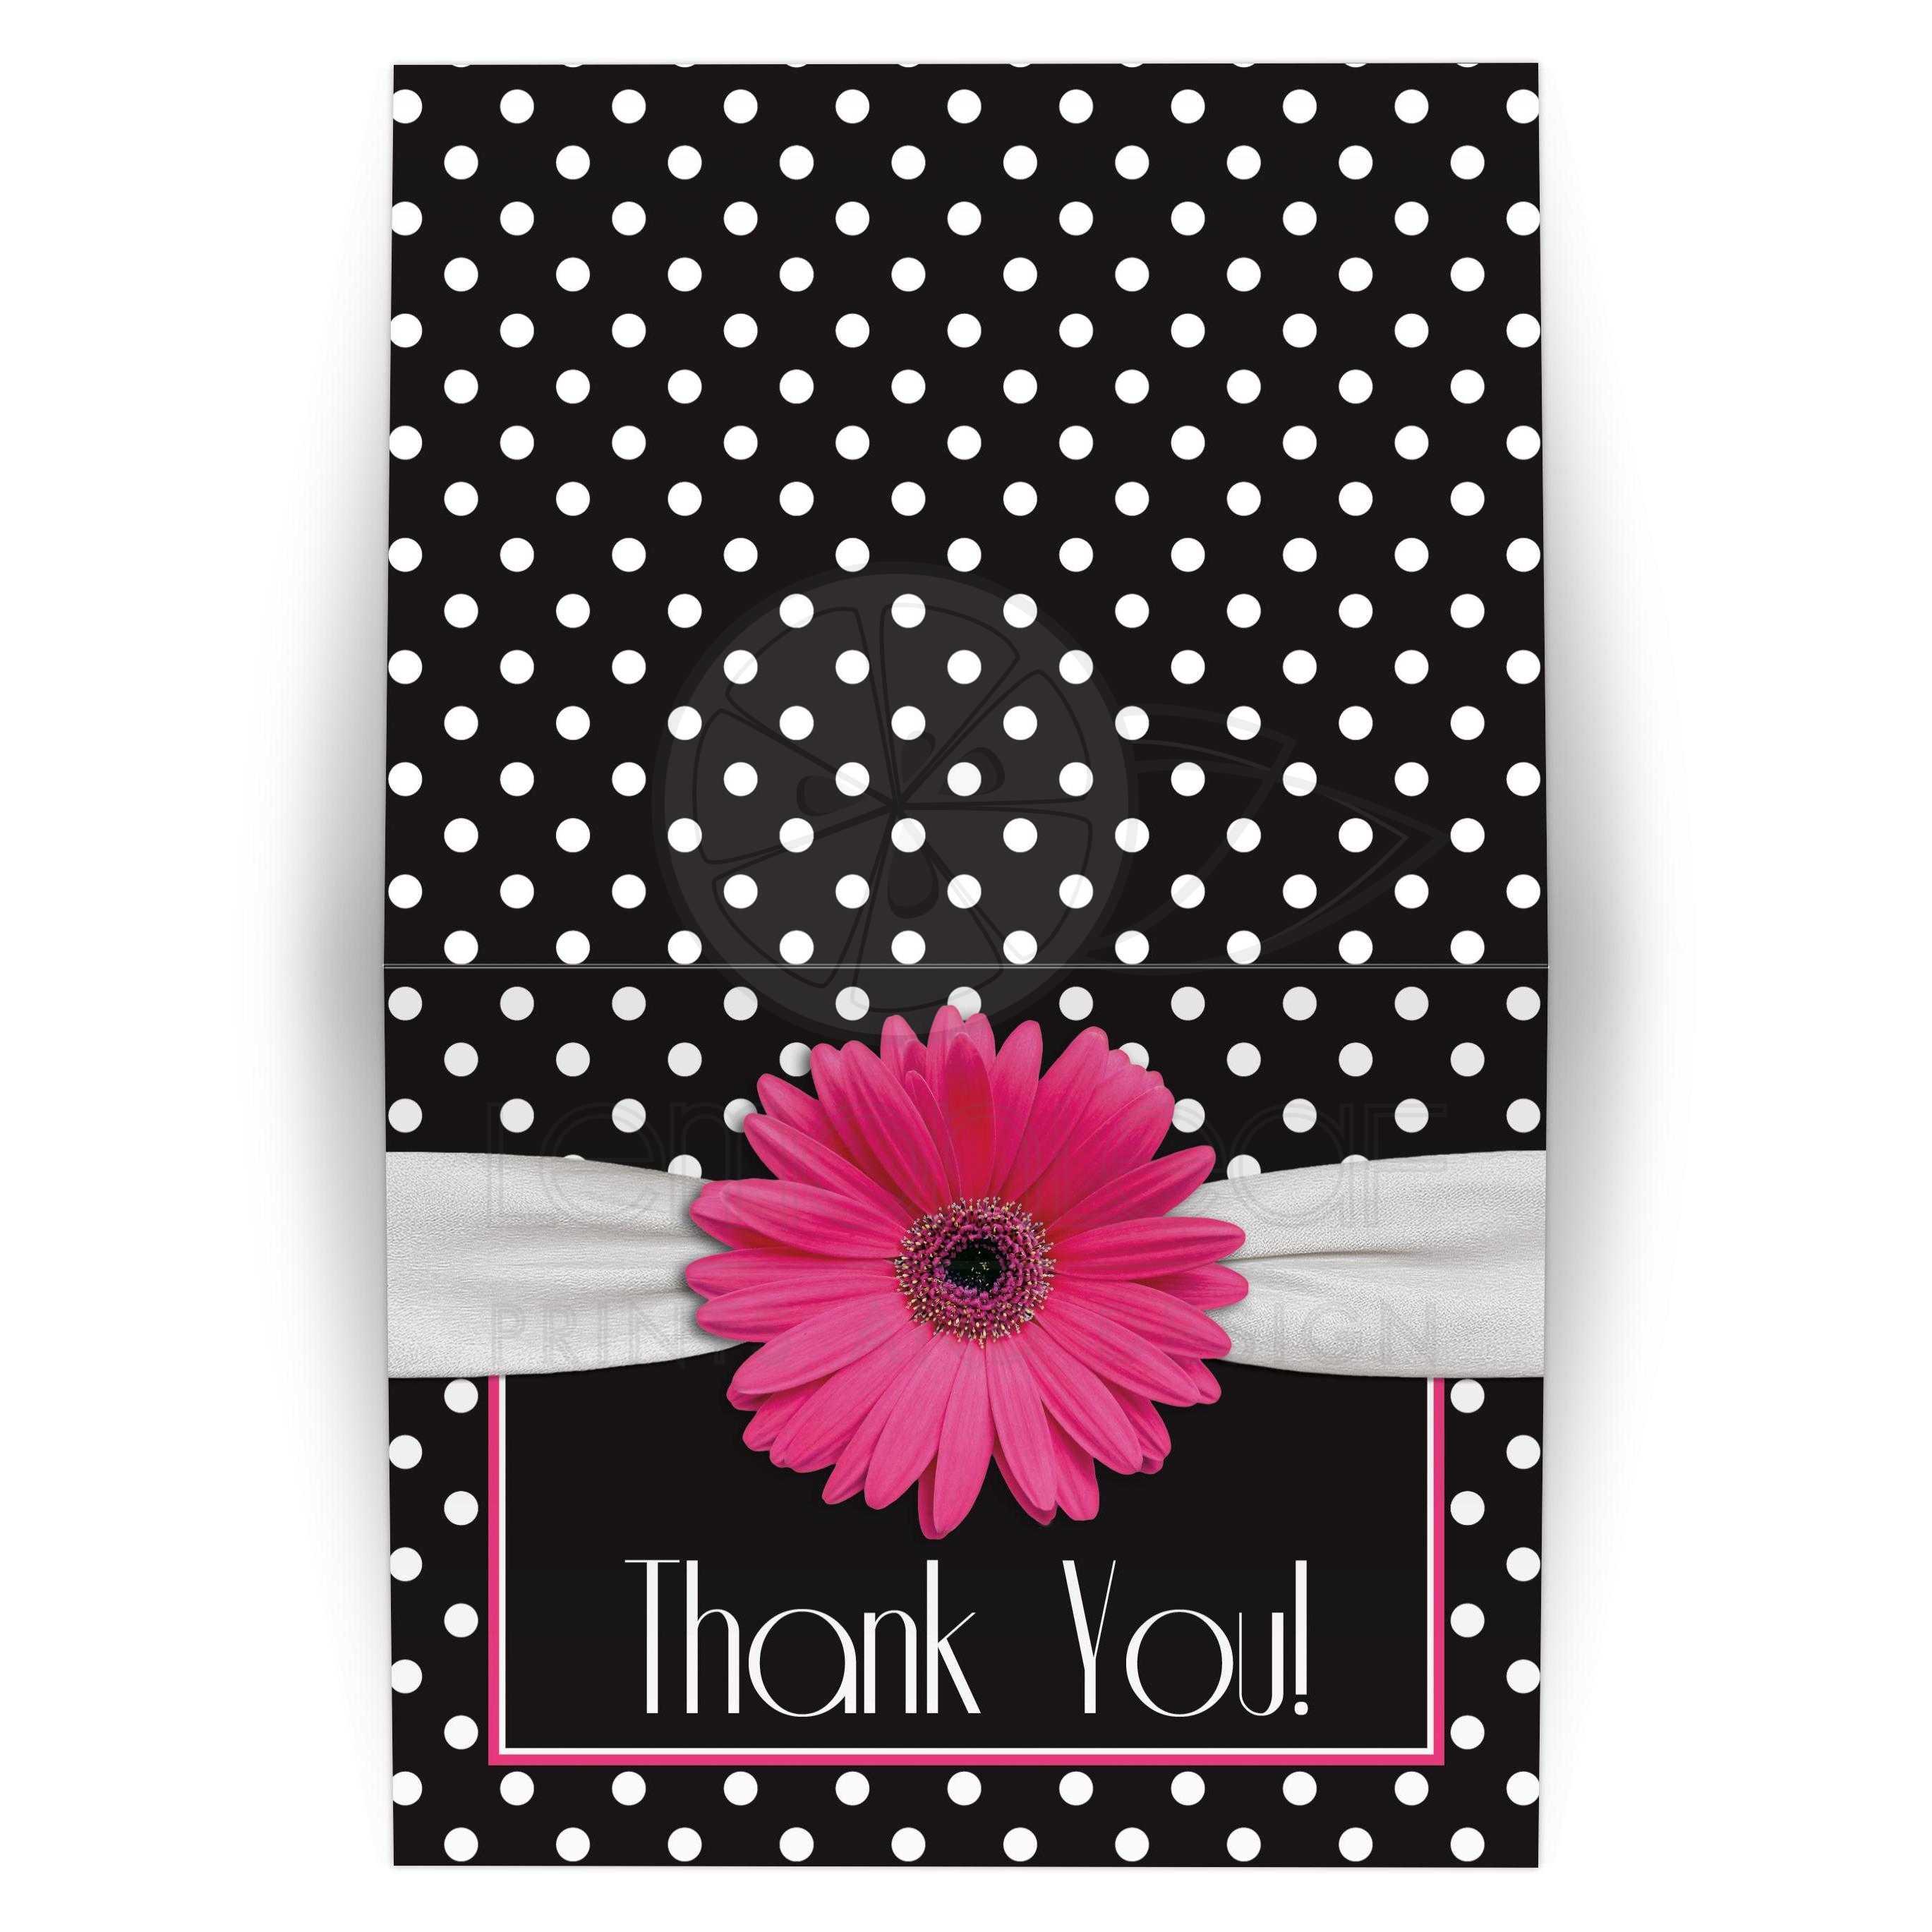 Pink Daisy Polka Dot Thank You Card | Pink Black White